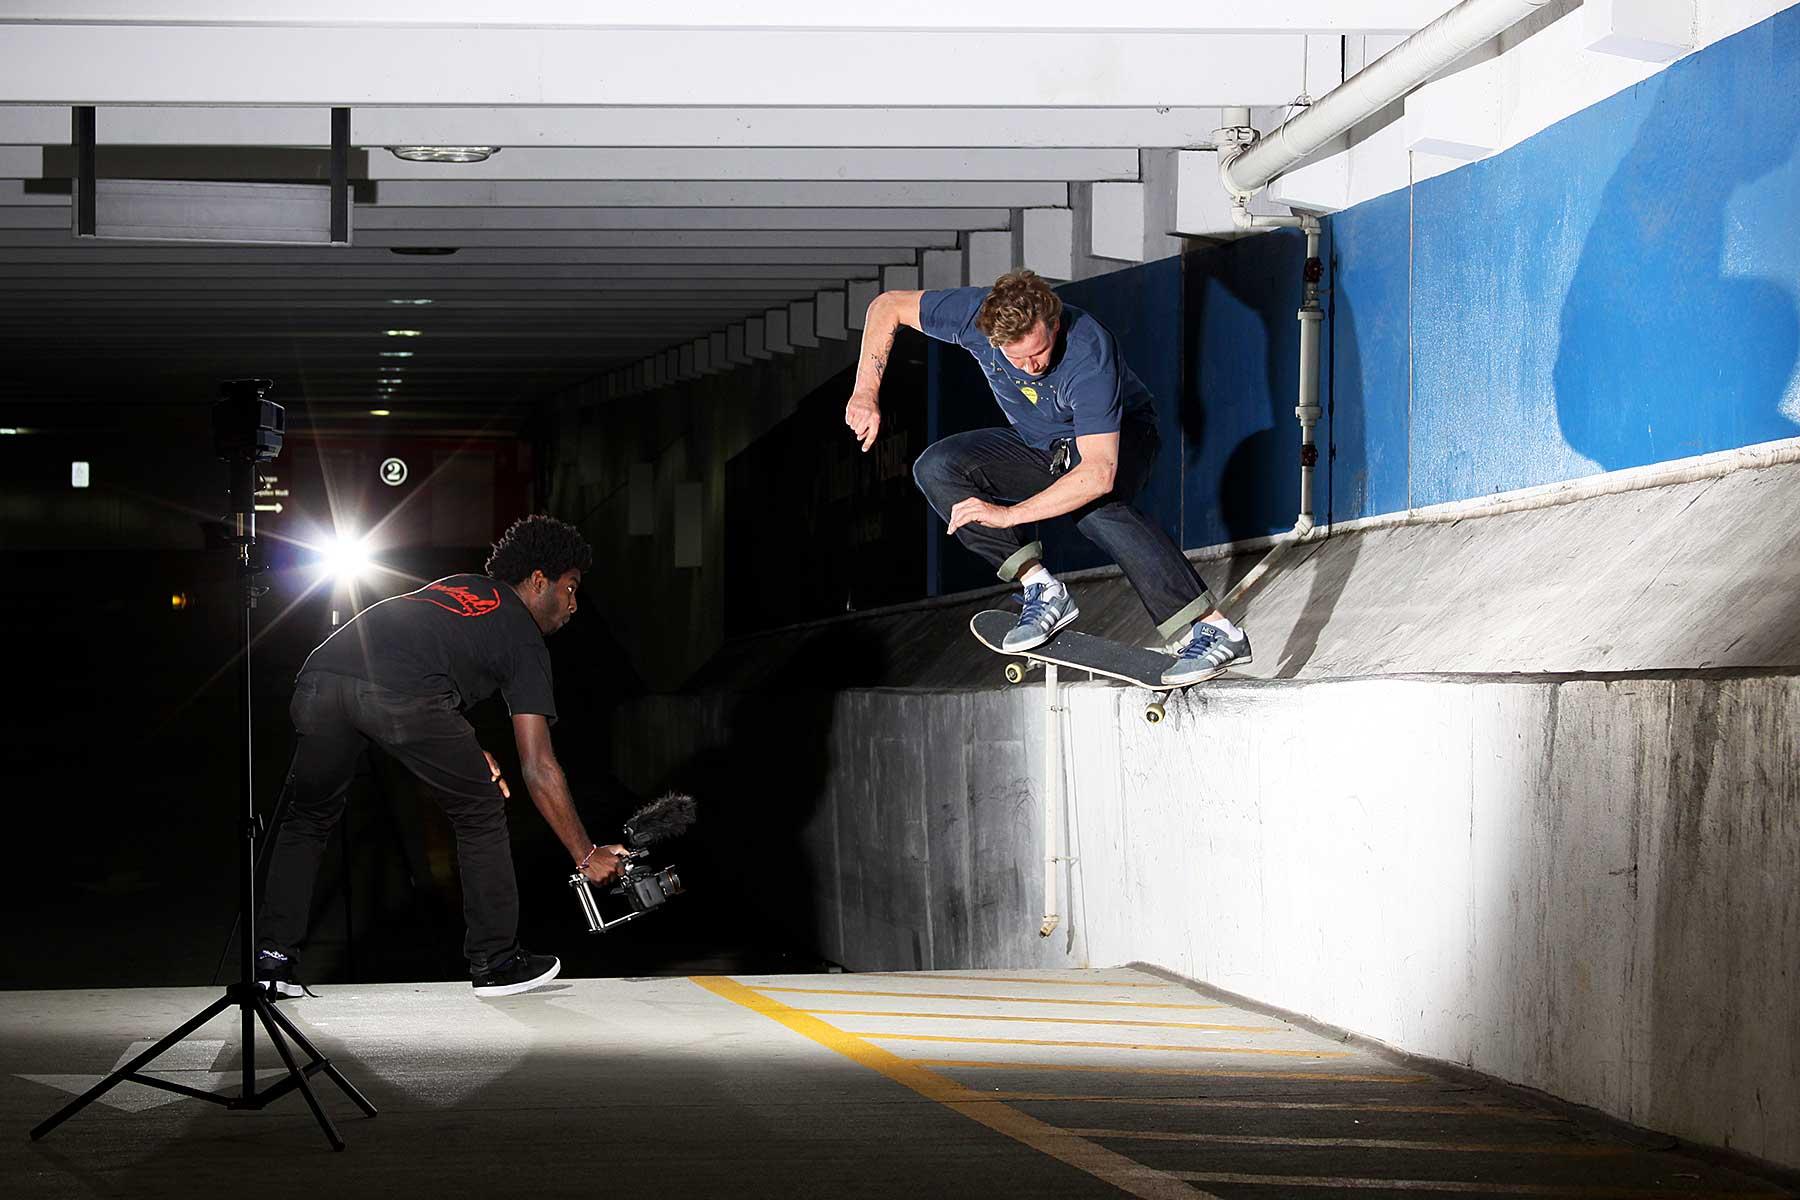 shawn owens filming sketchn norfolk va